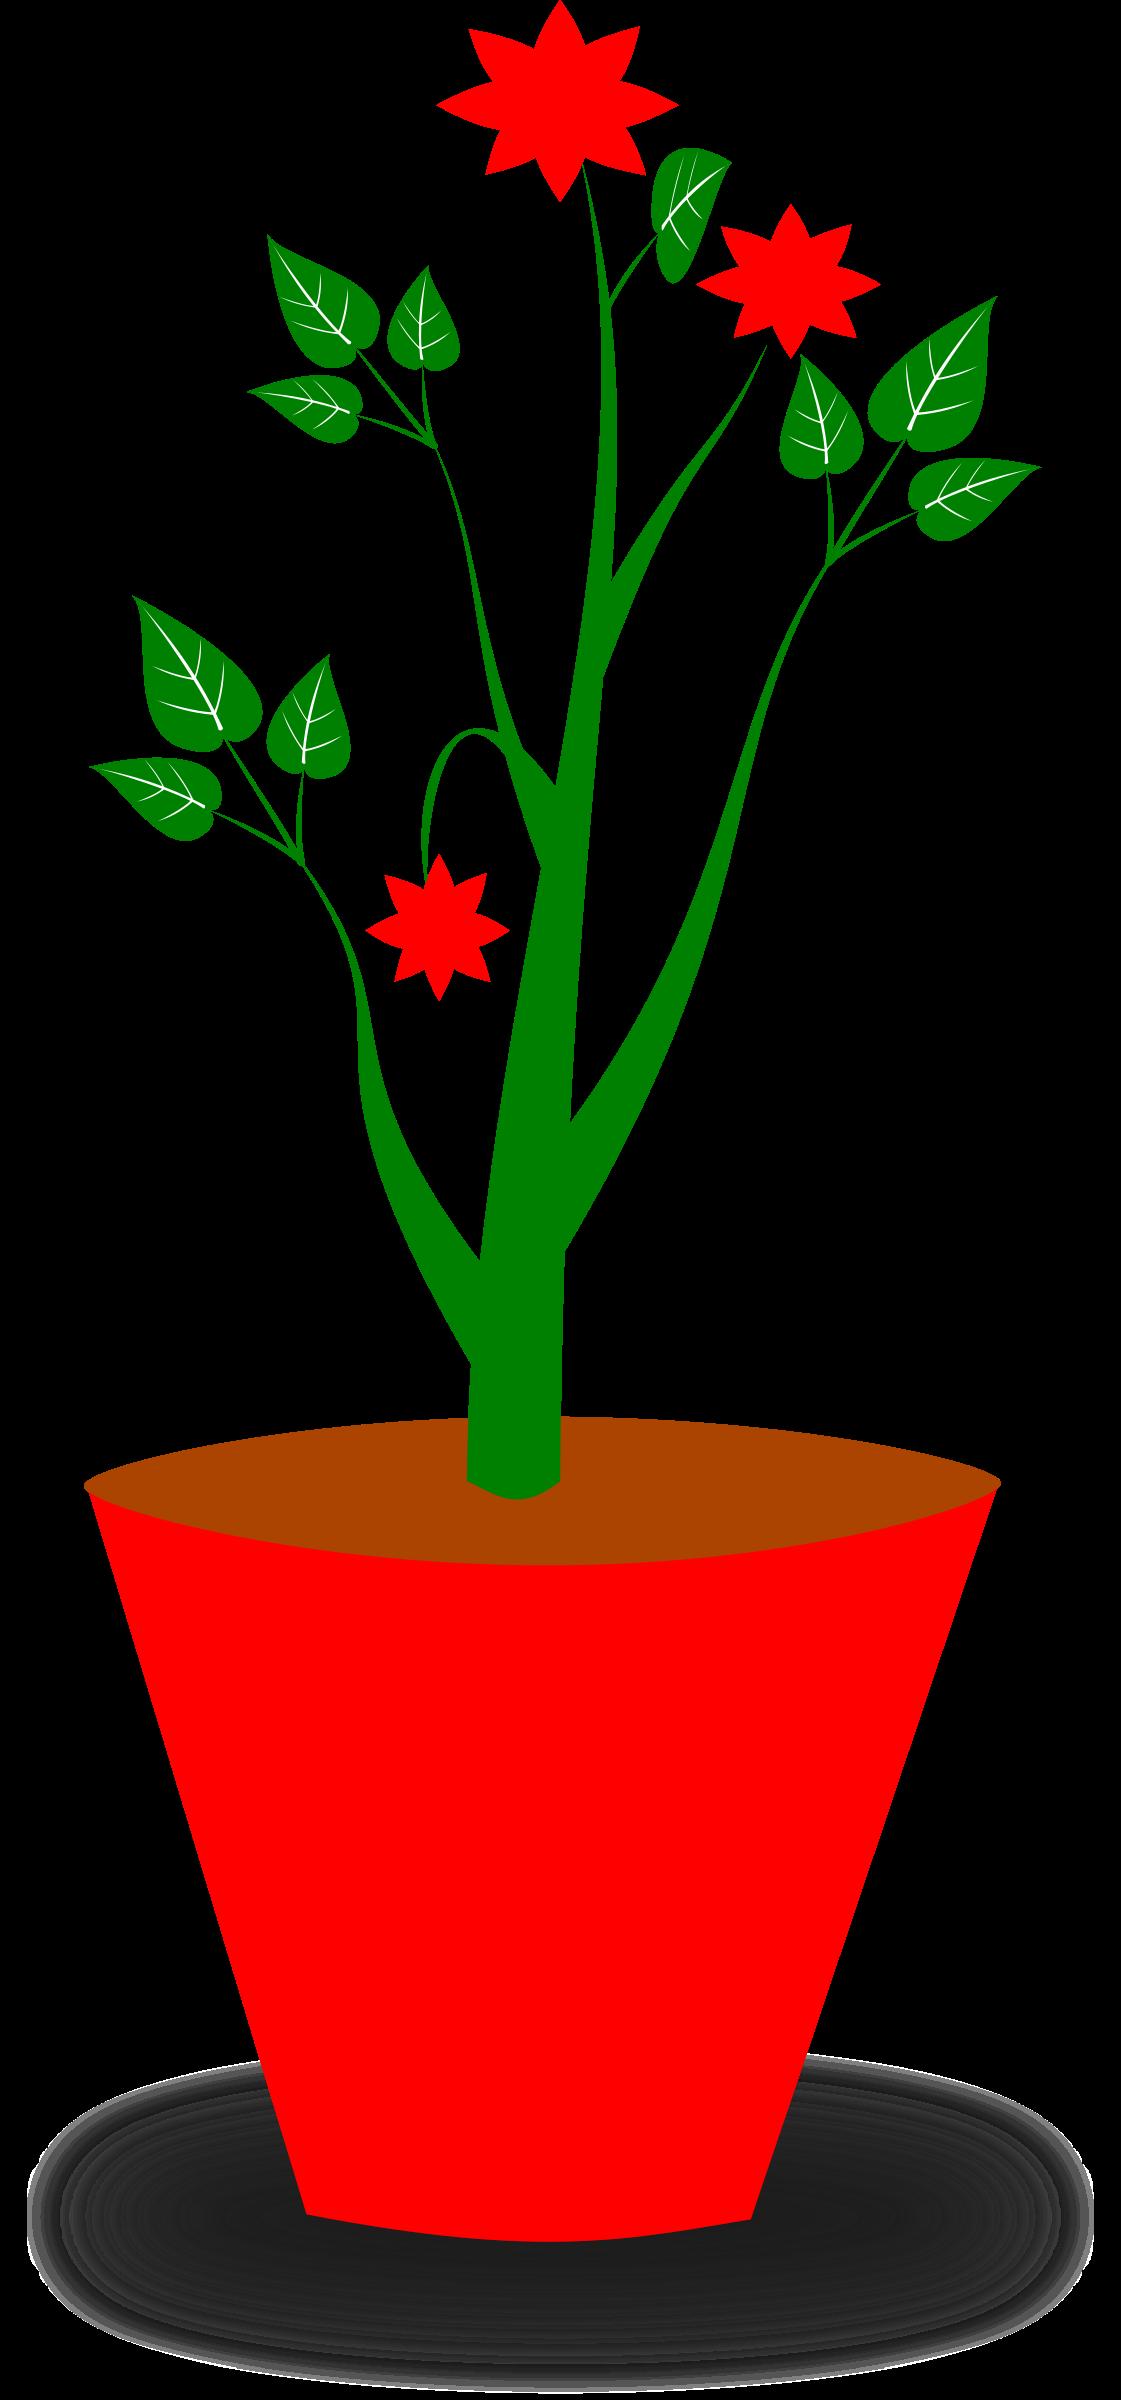 Planting clipart kid. Flower pot big image